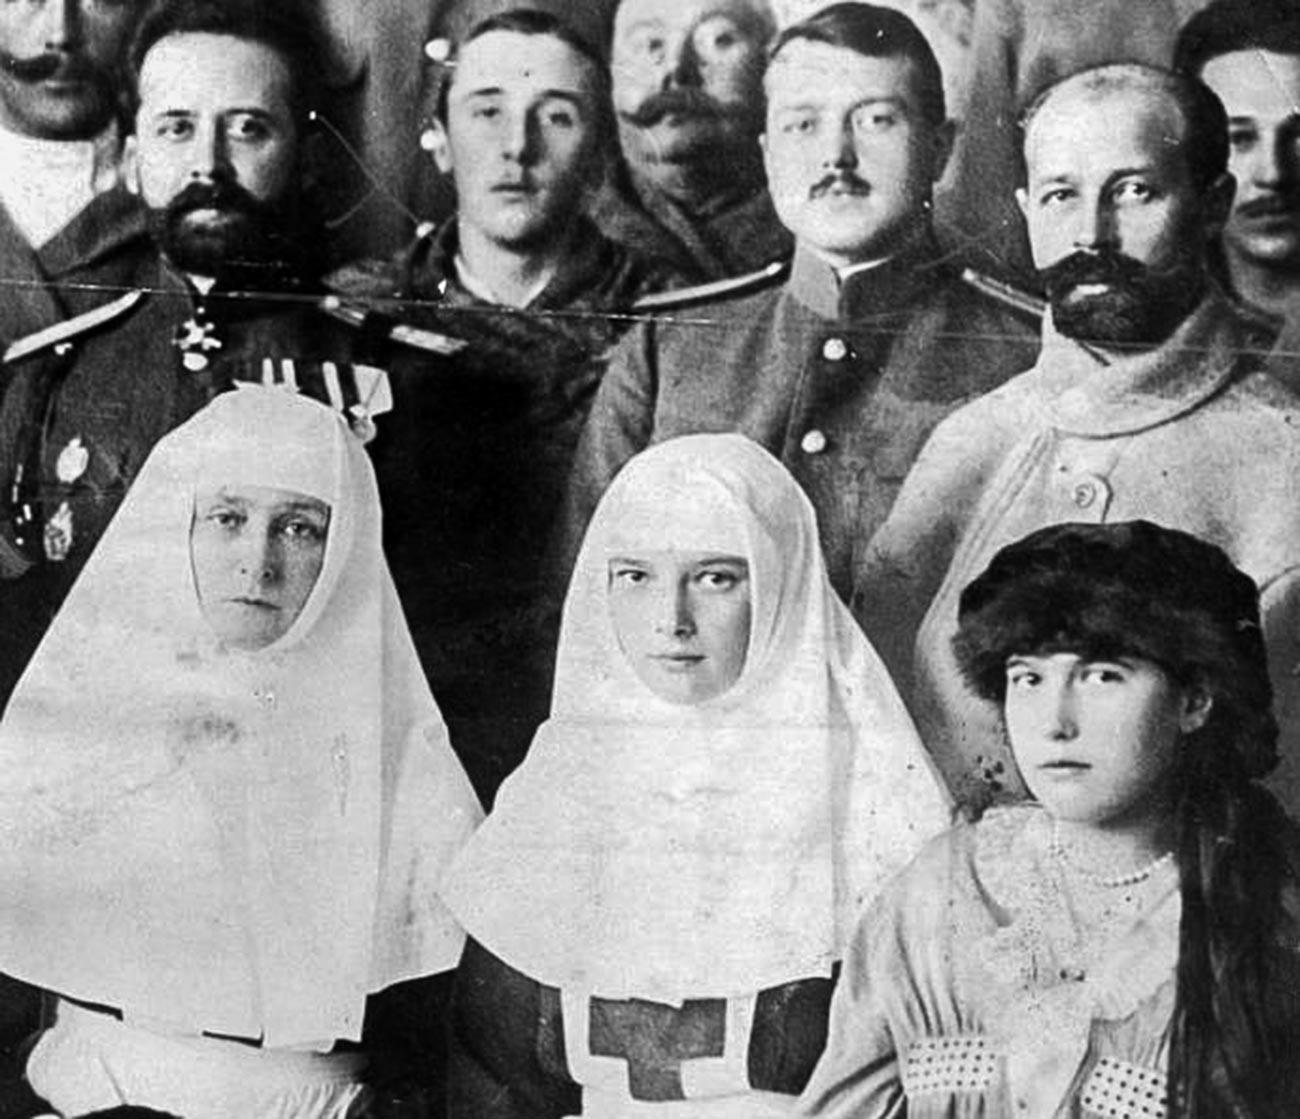 Empress Alexandra, Tatiana Nikolaevna end Anastasia Nikolaevna during WWI